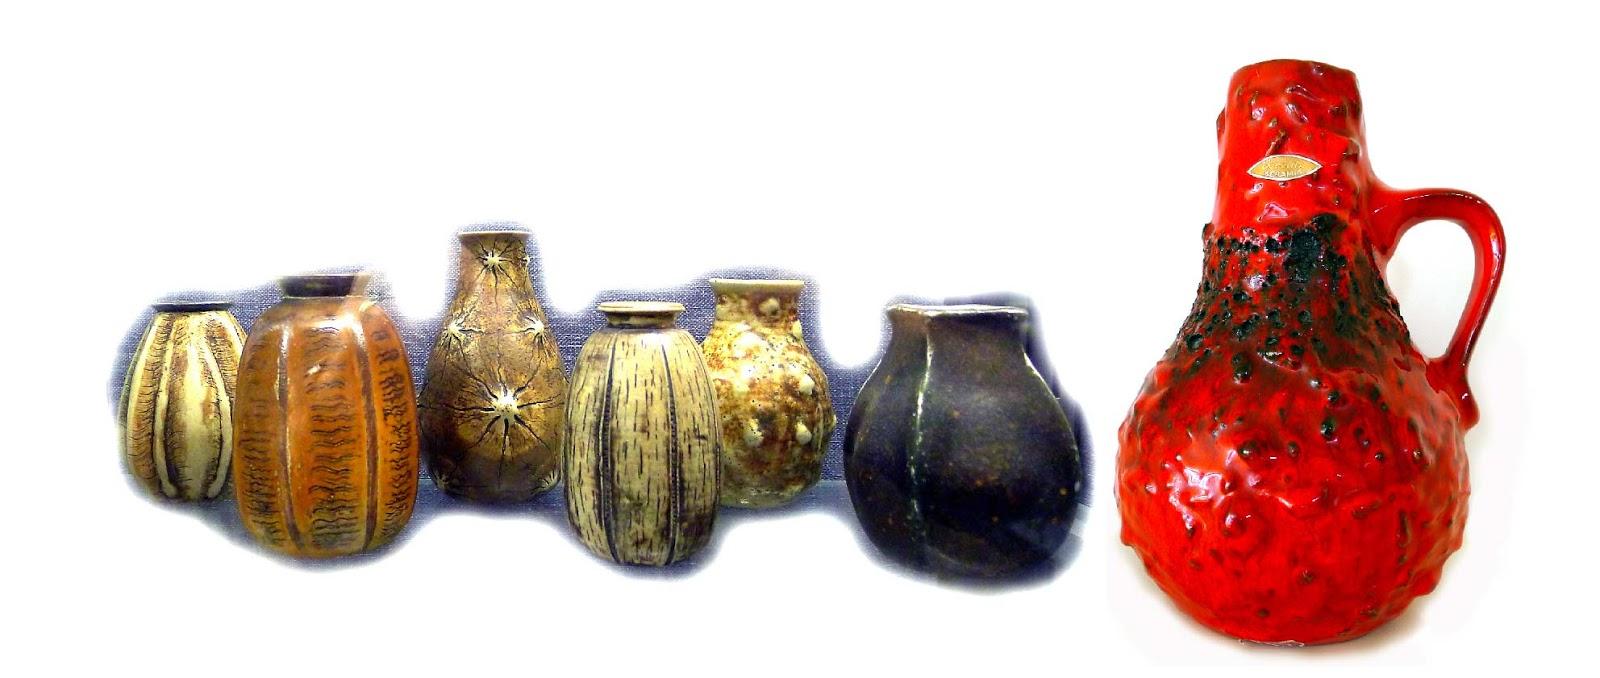 Ceramics conversations from vallauris to fat lava ceramic left martin brothers c1900 right kreutz keramik 1970s reviewsmspy